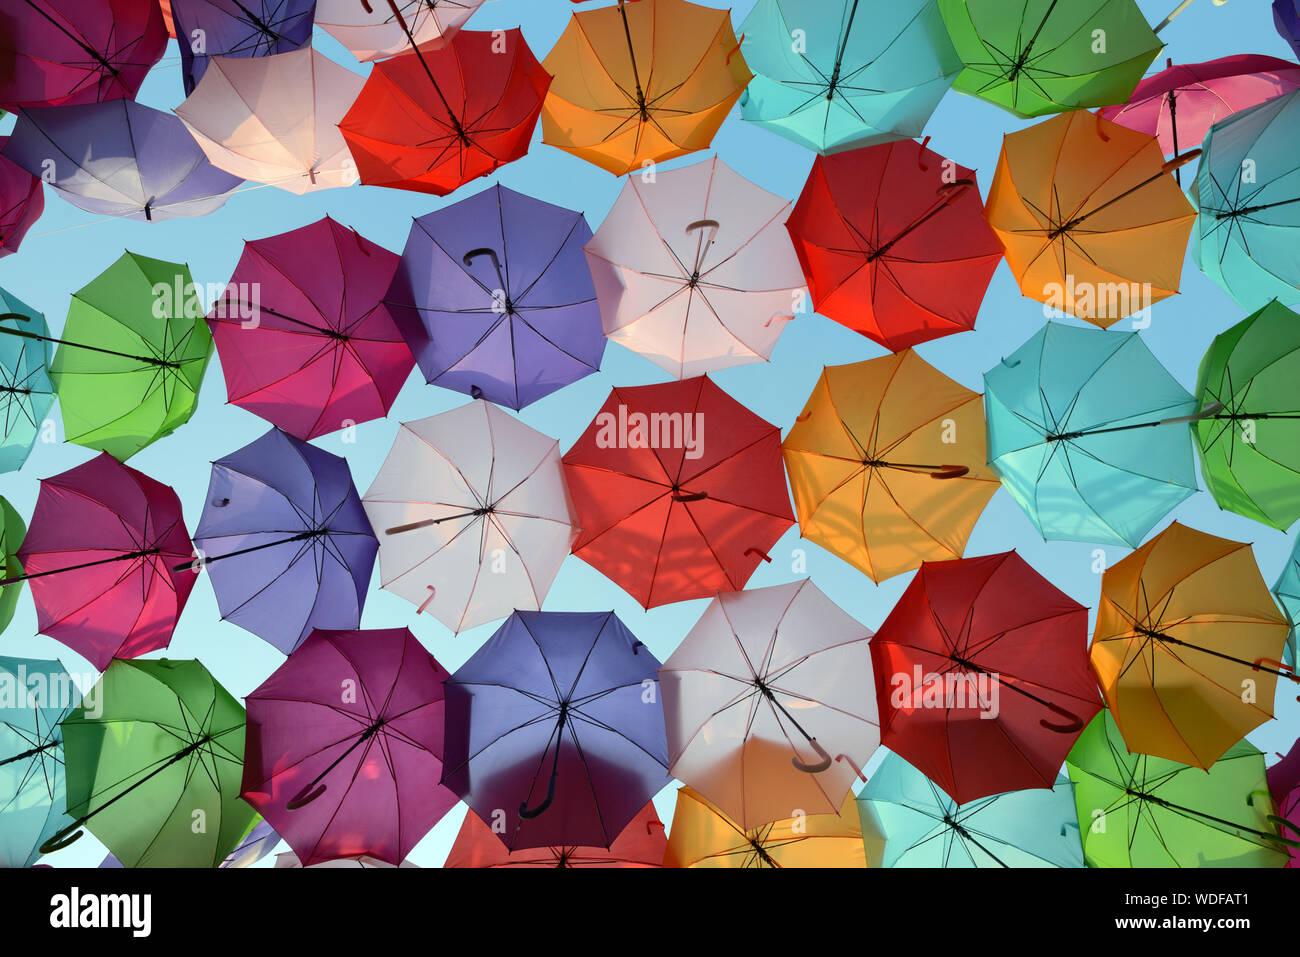 Coloridas sombrillas o paraguas colgando sobre el lugar, François VILLON, por artista Patricia Cunha paraguas Sky Project instalación de arte, Aix-en-Provence Foto de stock